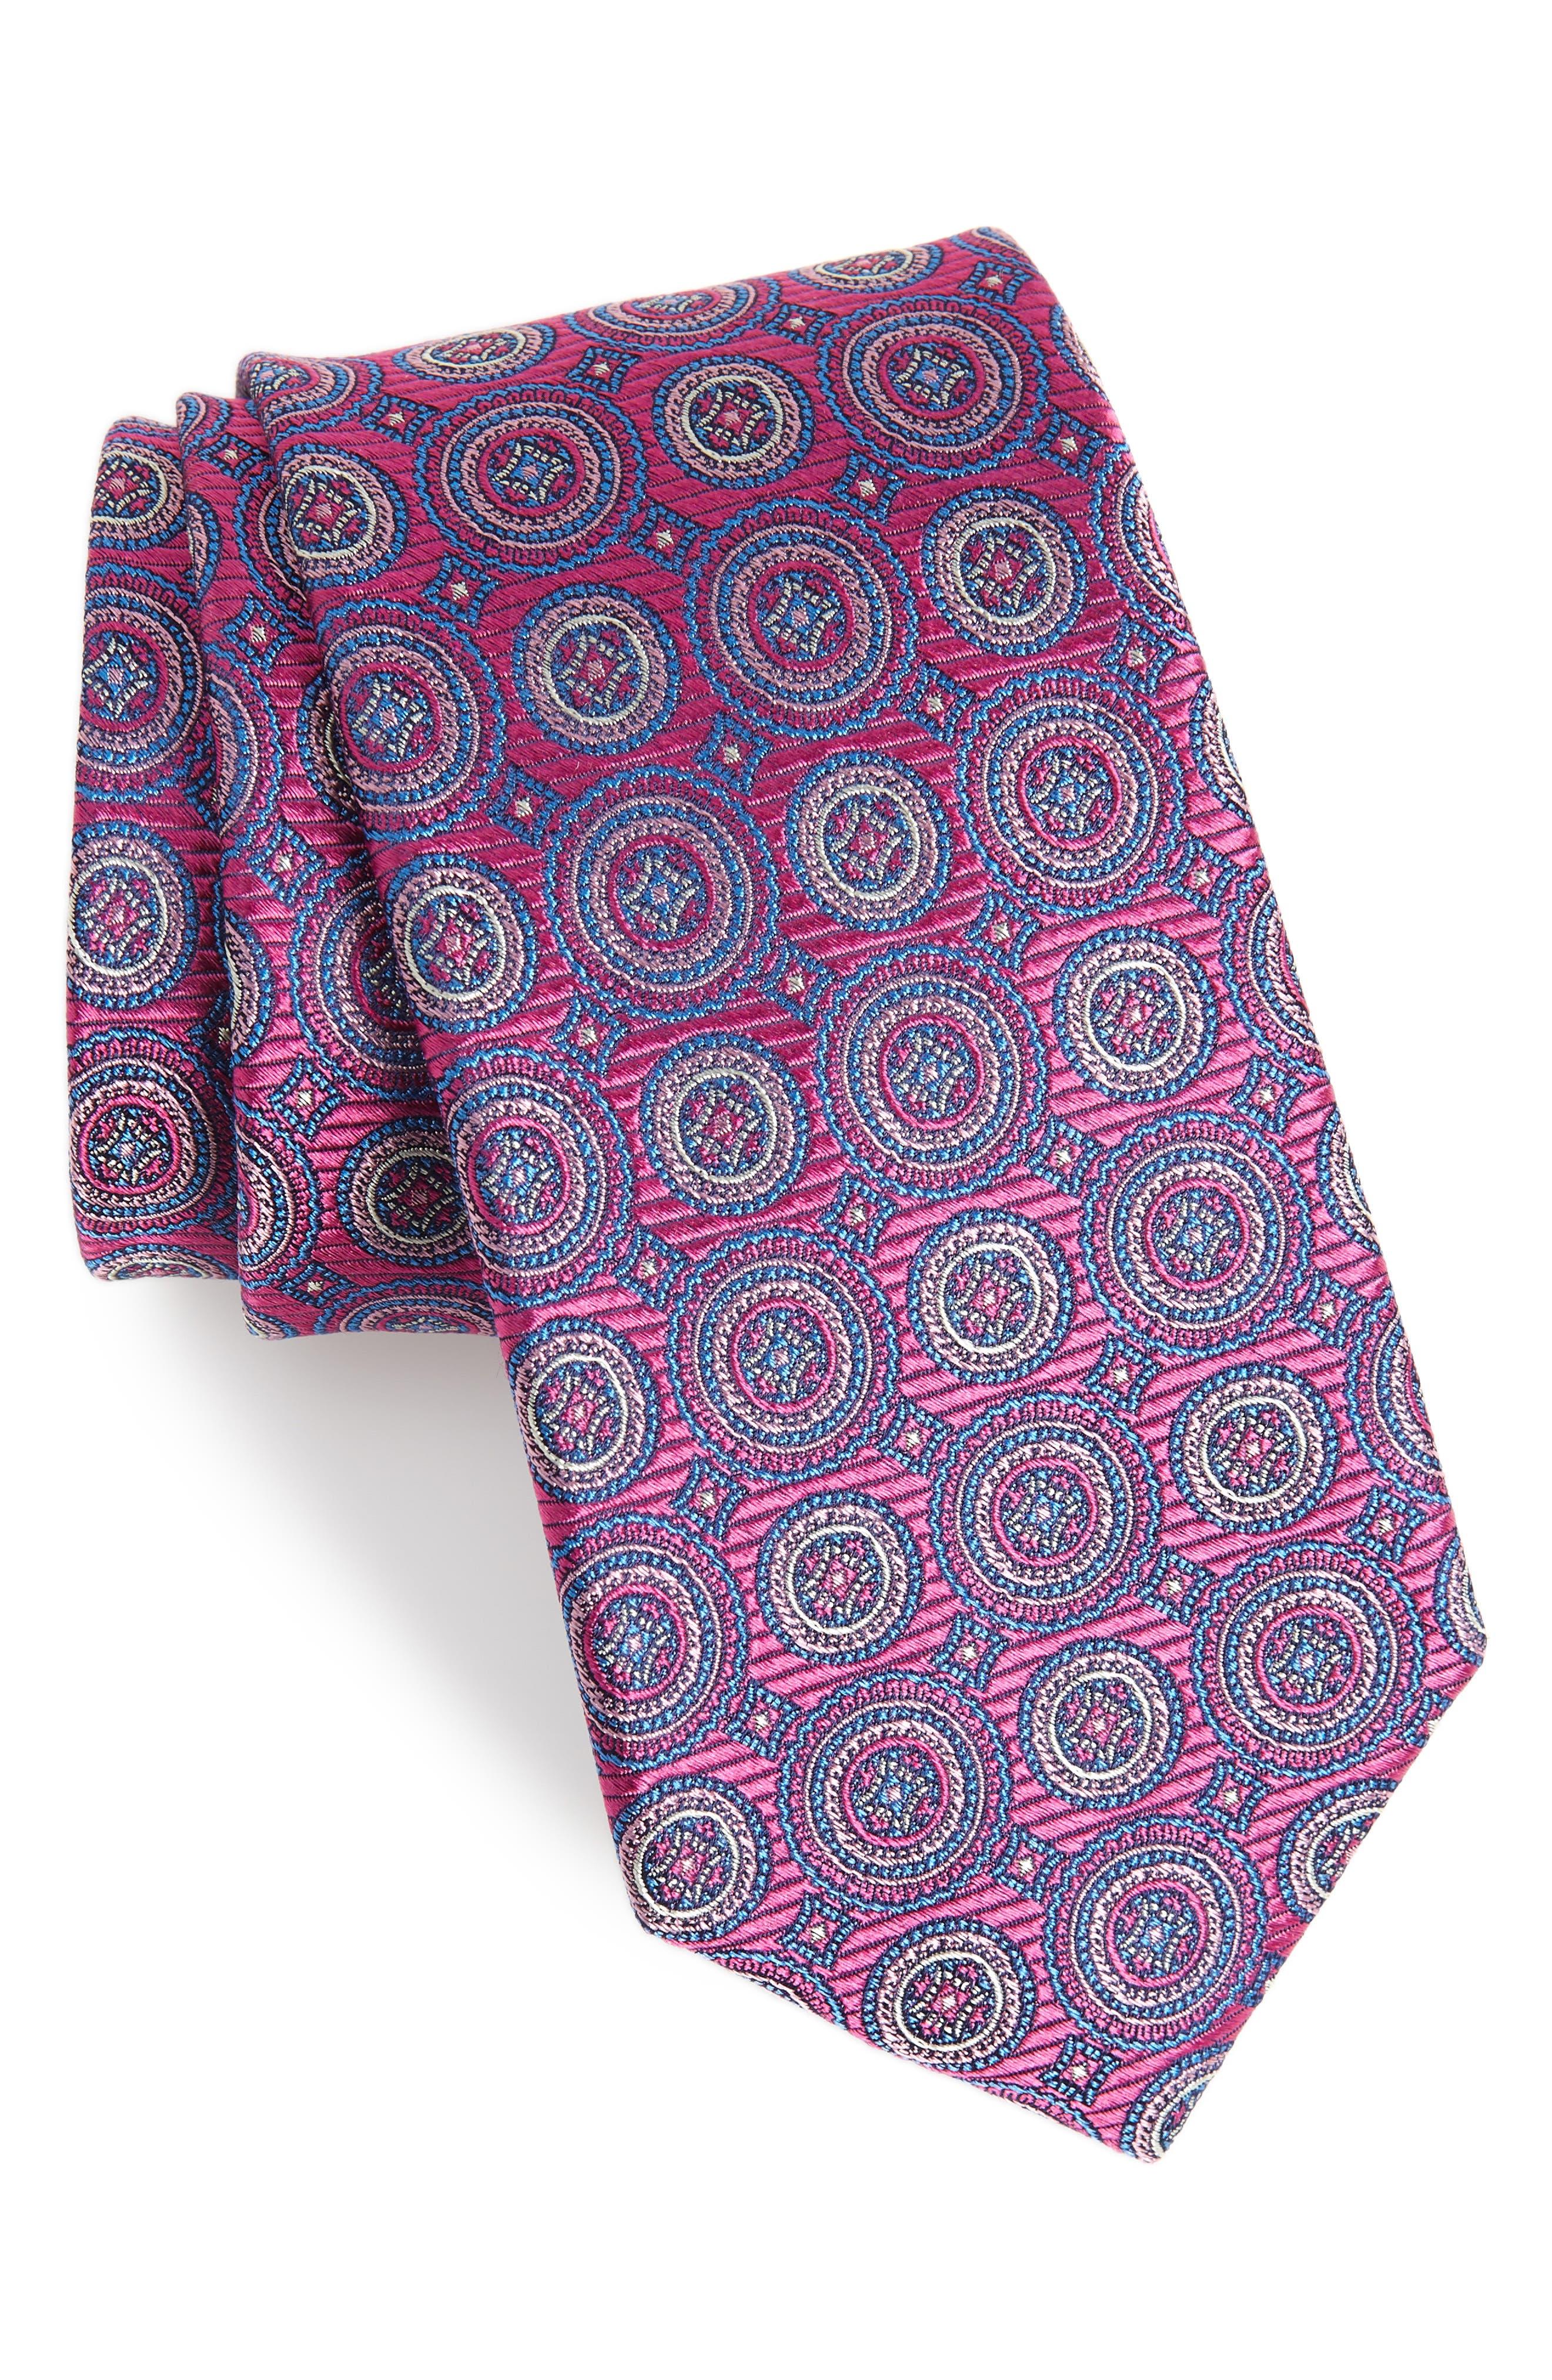 Santa Lucia Circles Silk Tie,                             Main thumbnail 1, color,                             Red